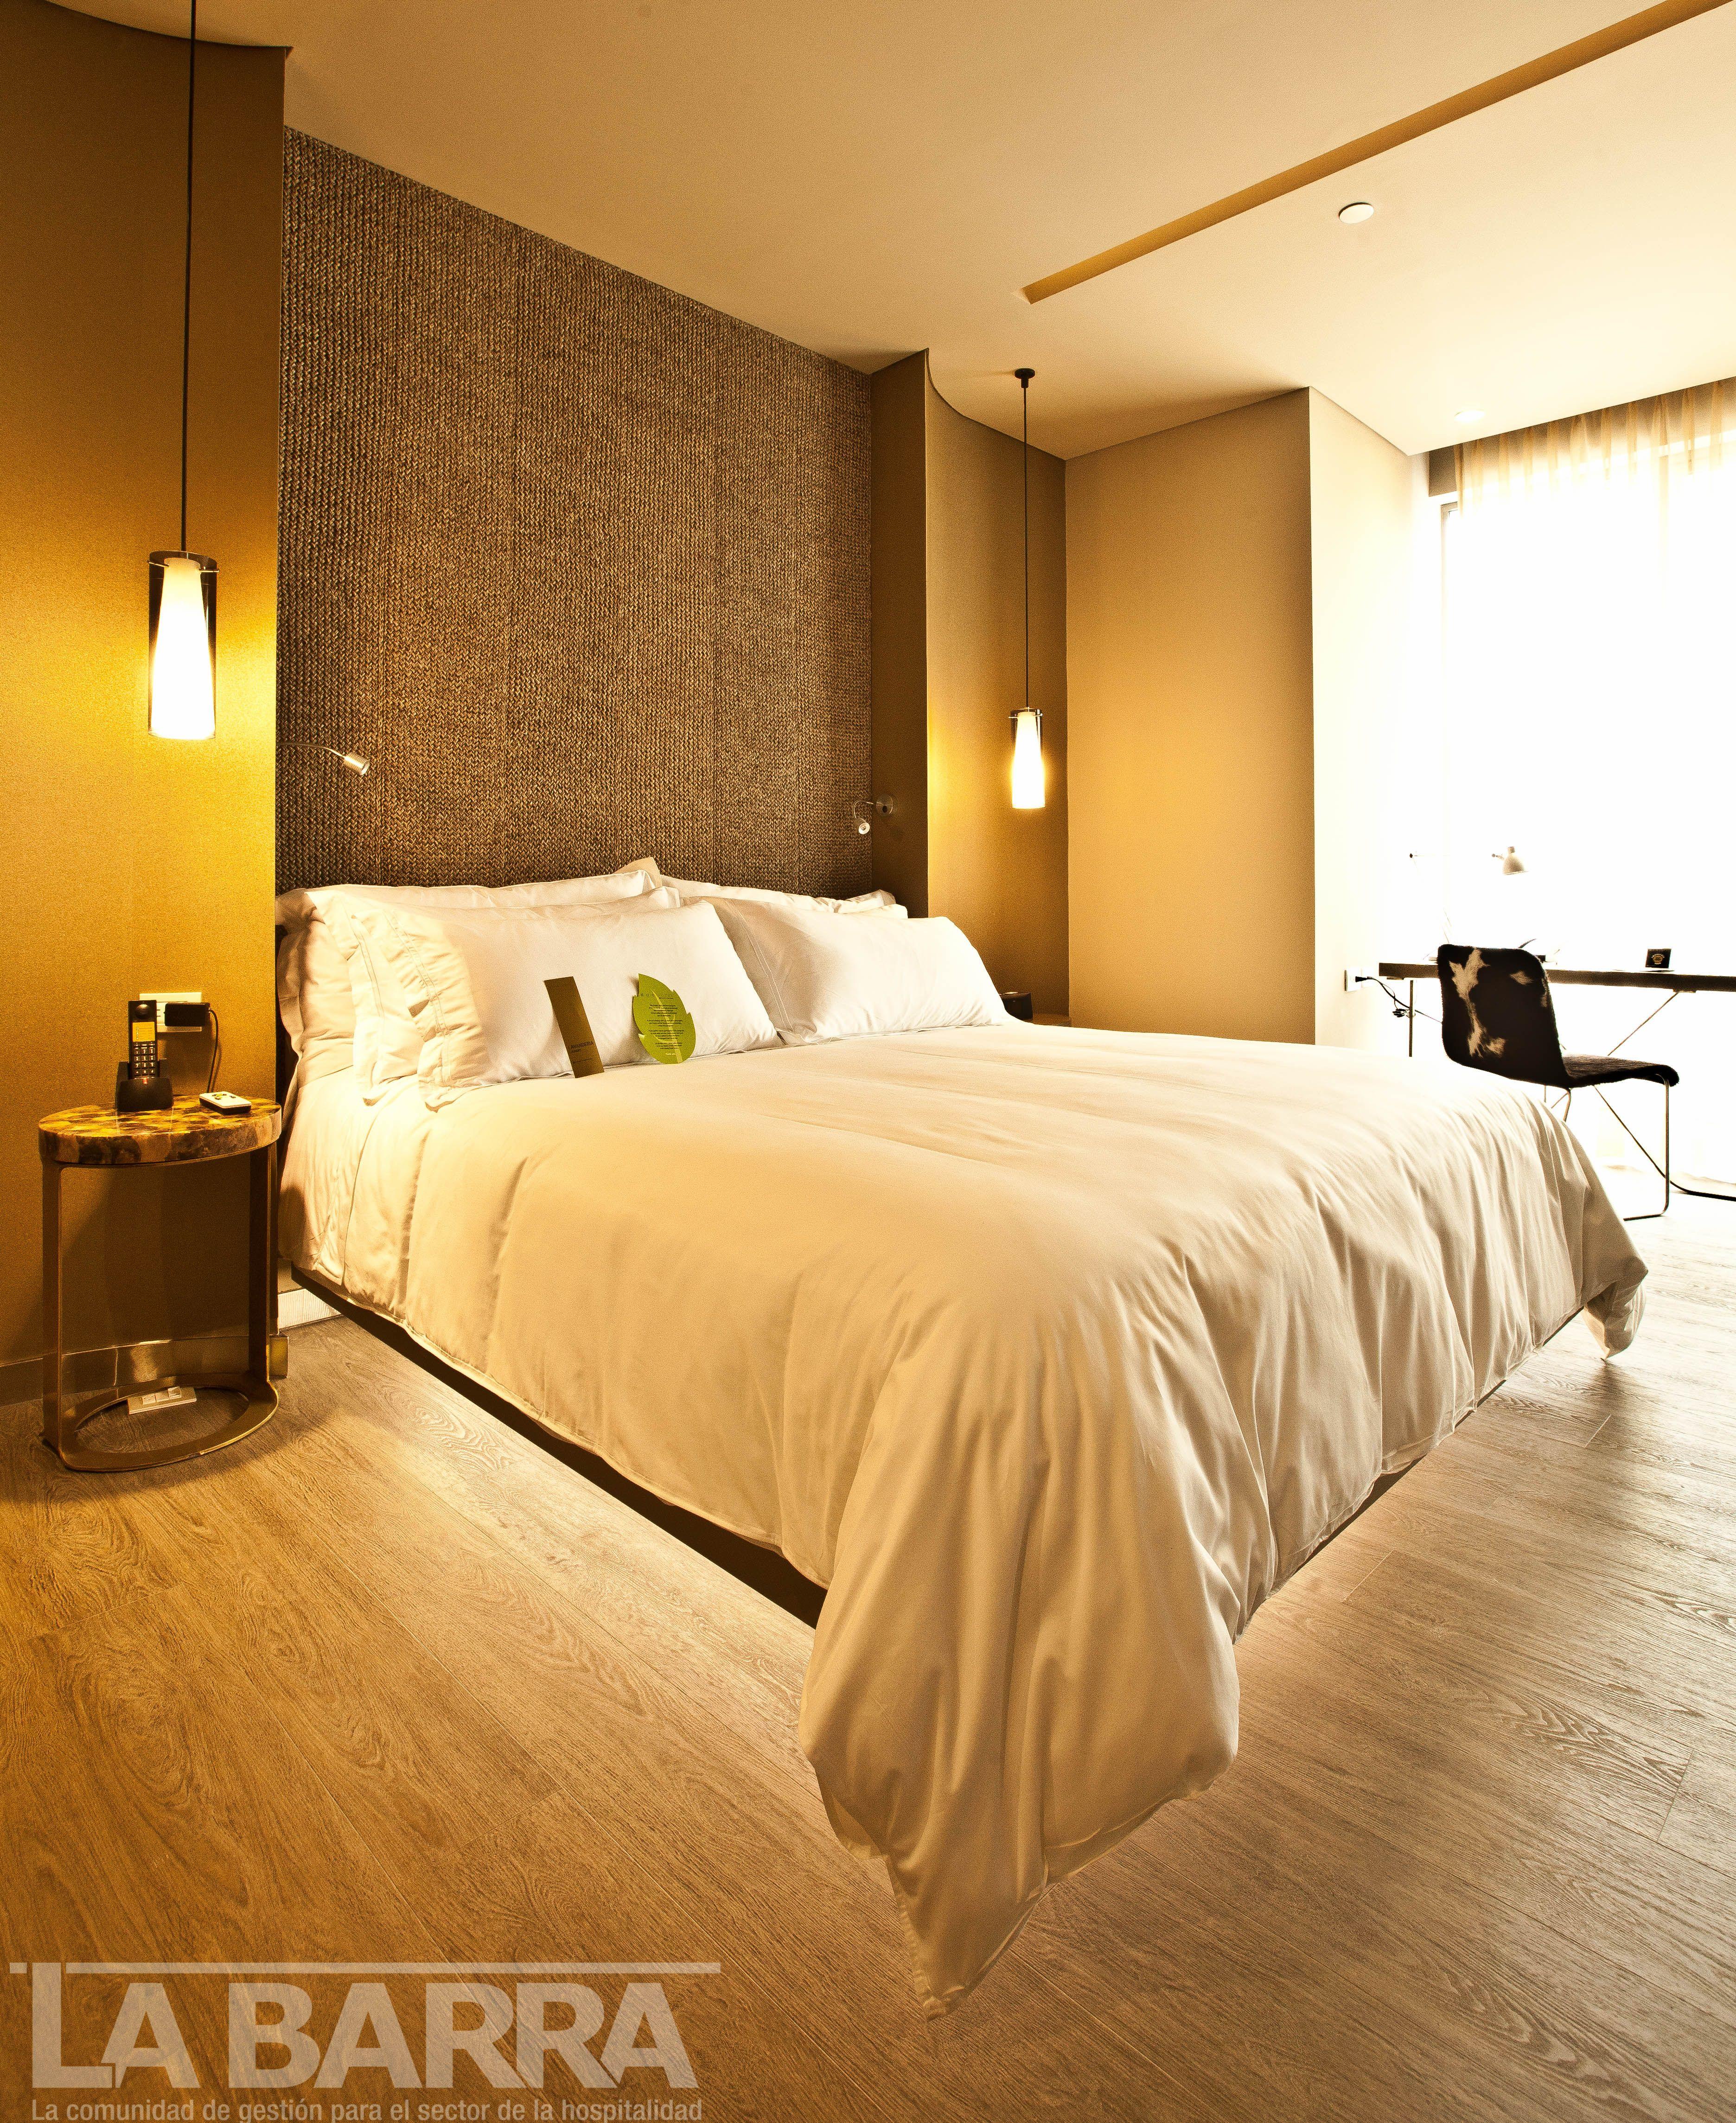 B.O.G Hotel, primer hotel de diseño en Colombia http://ow.ly/eR7AW